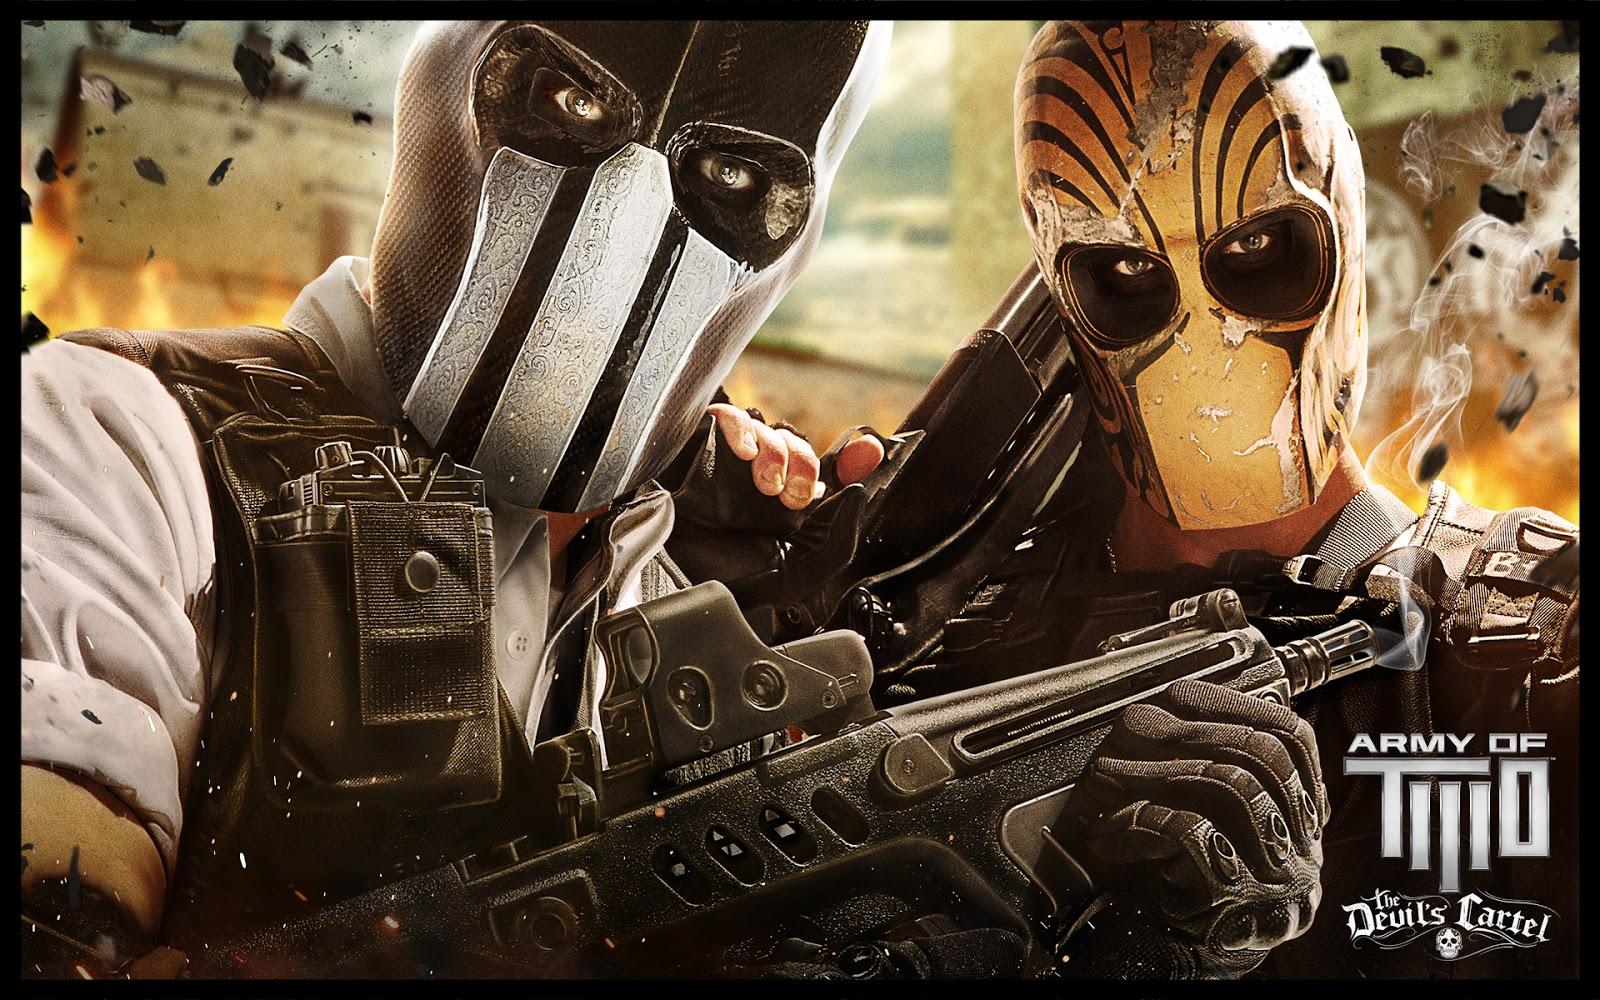 http://4.bp.blogspot.com/-3rF-q5uGzhE/UMZ0G6go-YI/AAAAAAAAQb8/nDogdzIAcC4/s1600/army-of-two-devils-cartel-6.jpeg